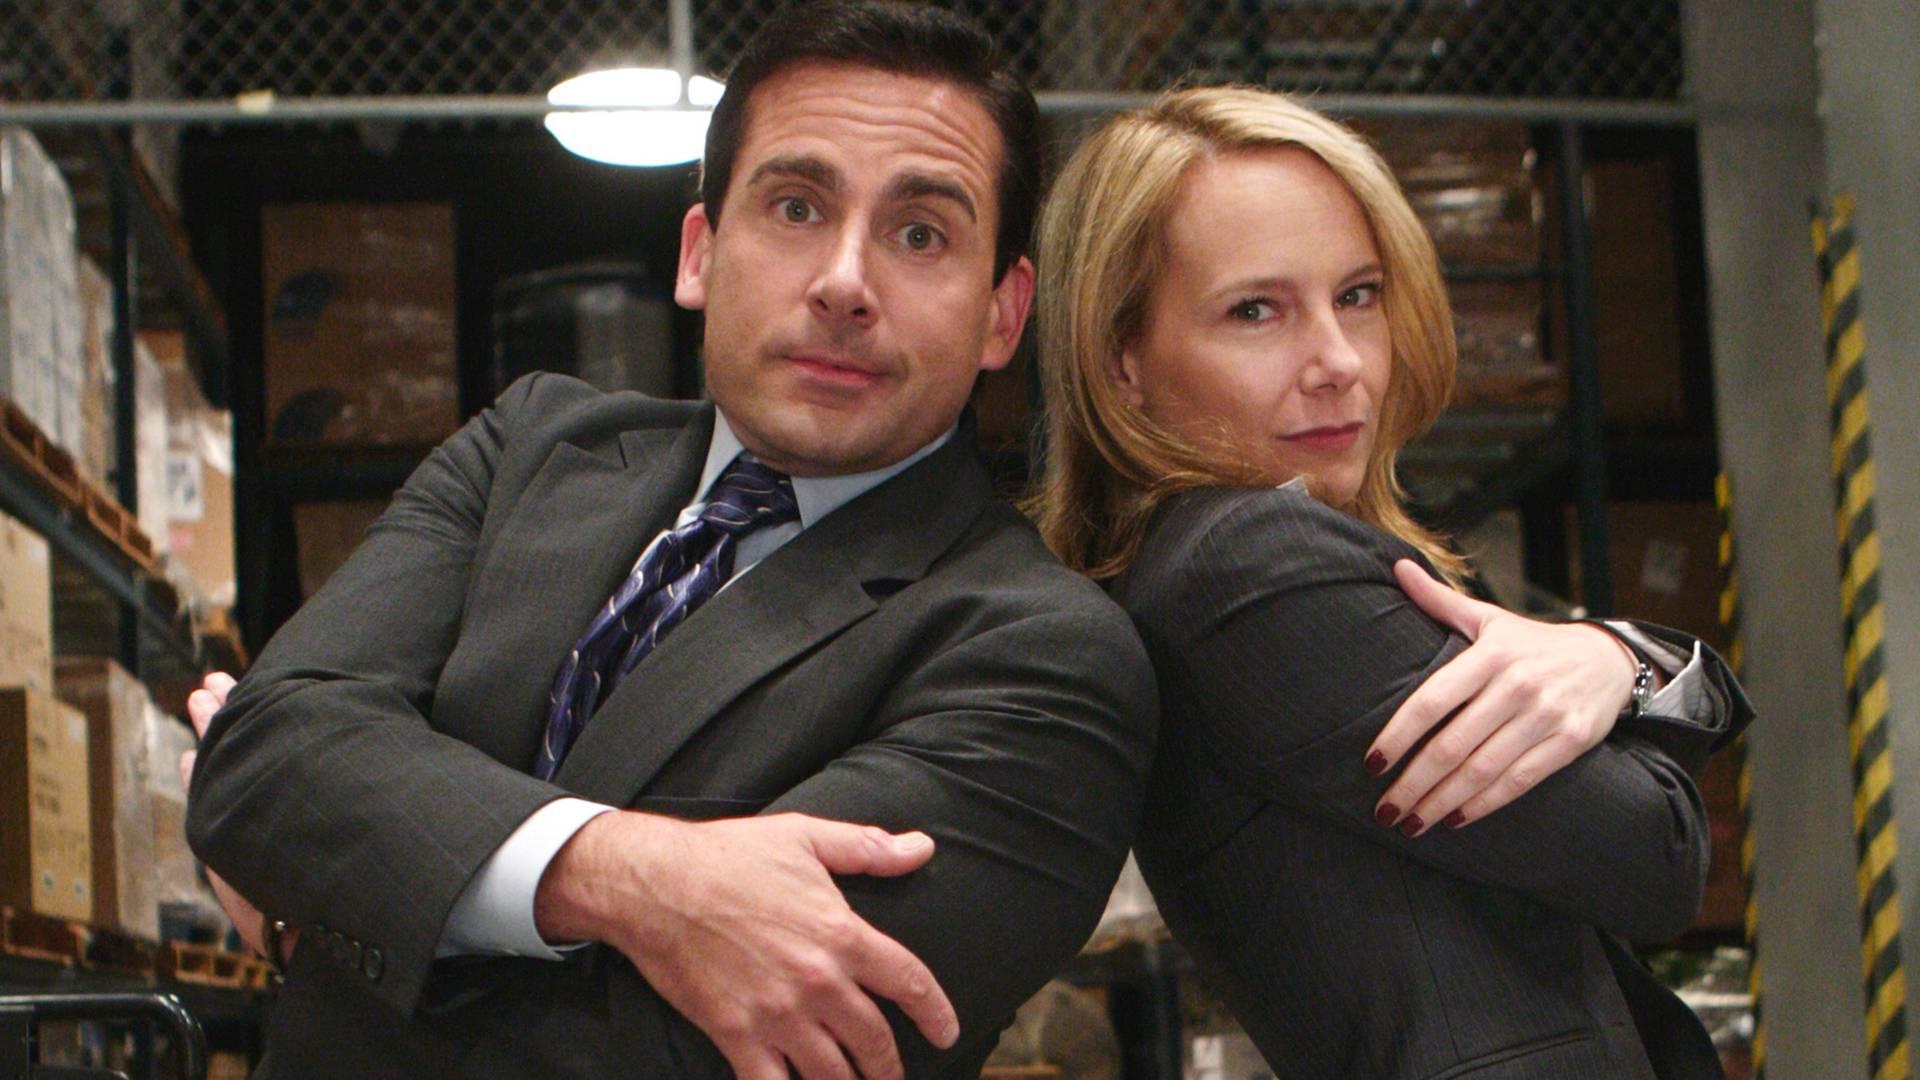 The Office Season 5 Episode 1